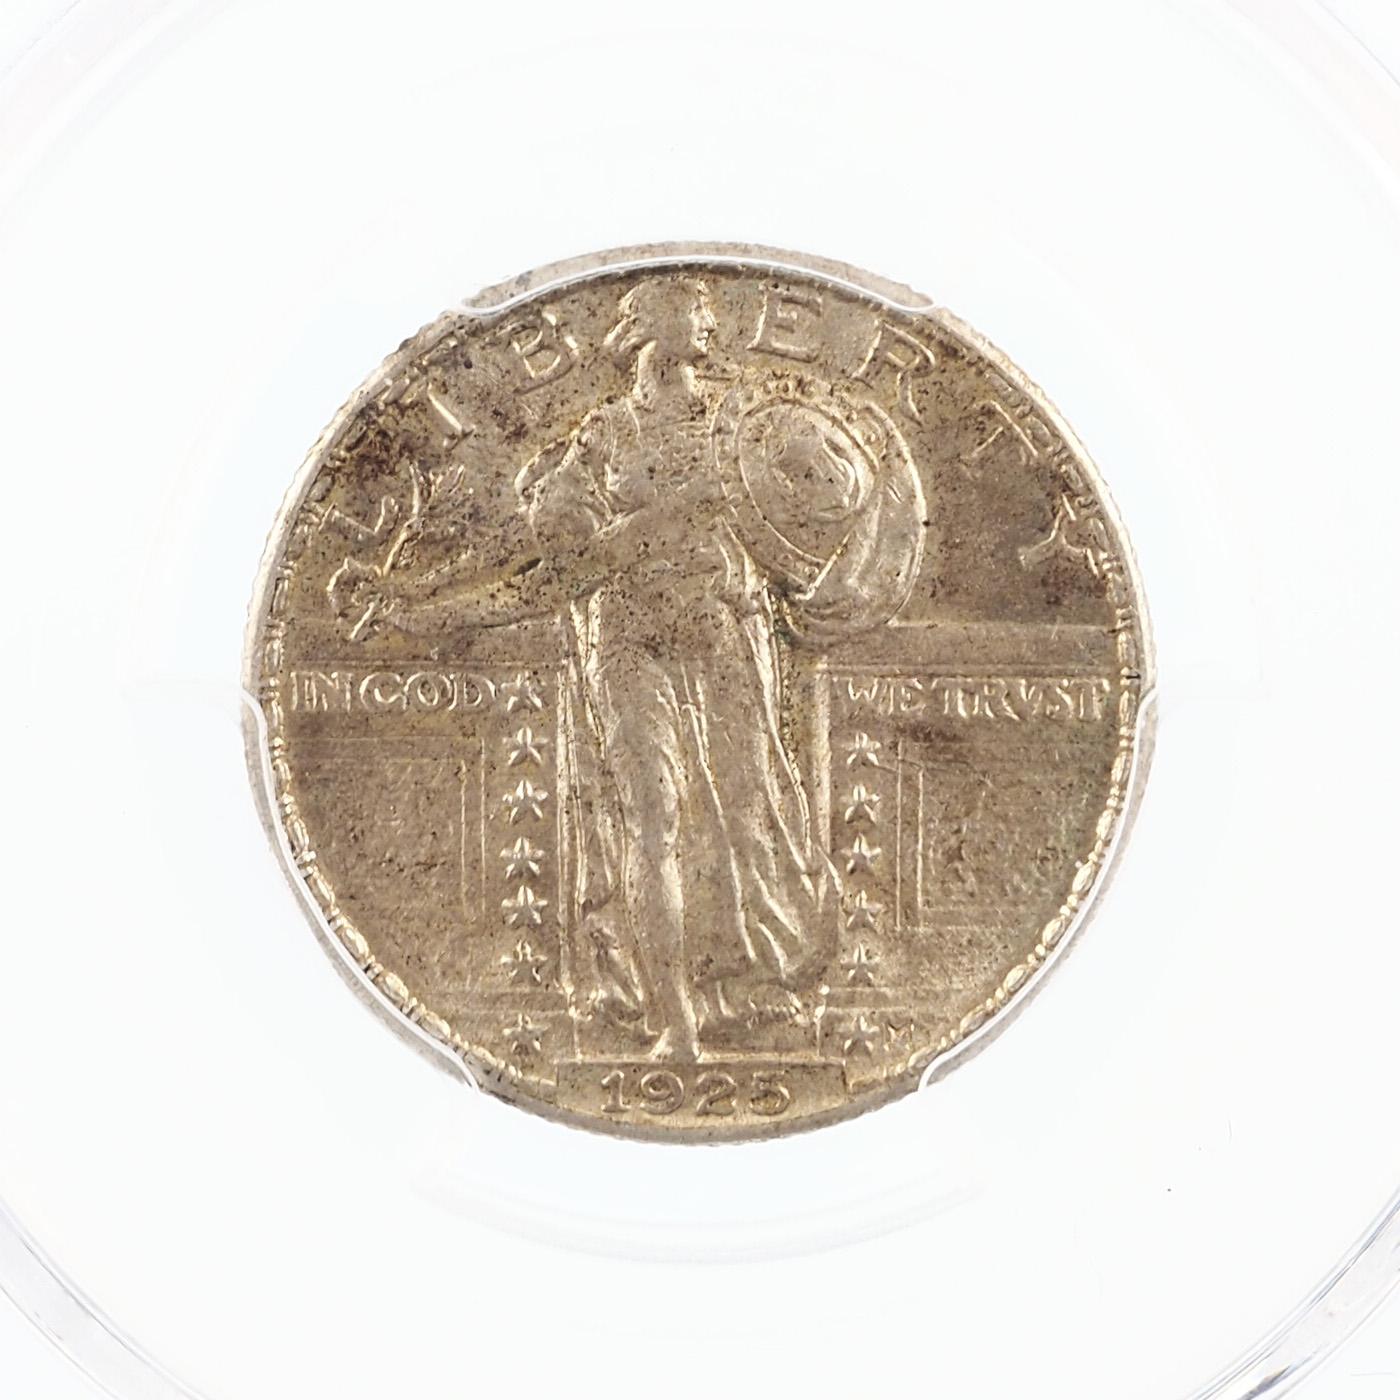 États-Unis, Quarter 1925 Philadelphie, Standing Liberty, KM 145, PCGS AU58